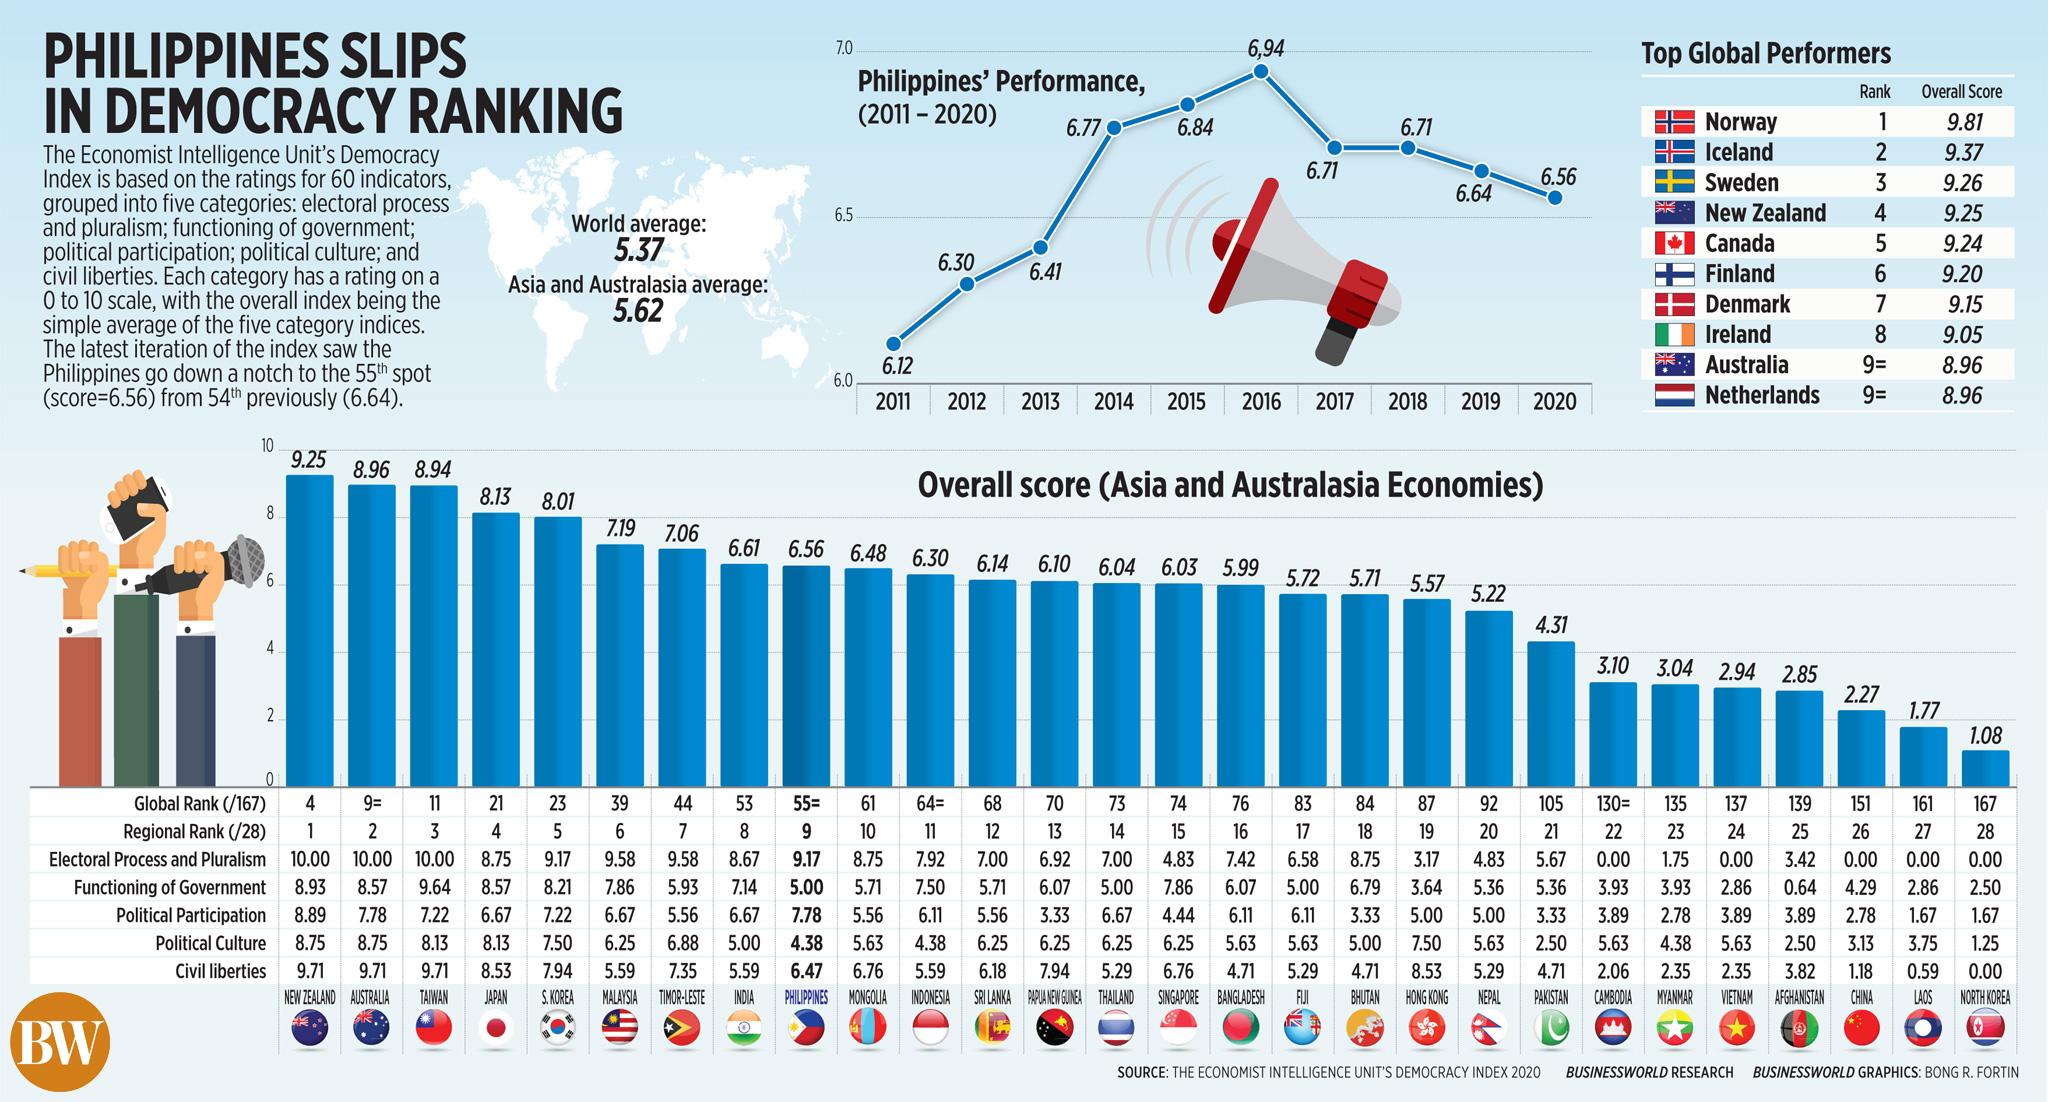 Philippines slips in democracy ranking